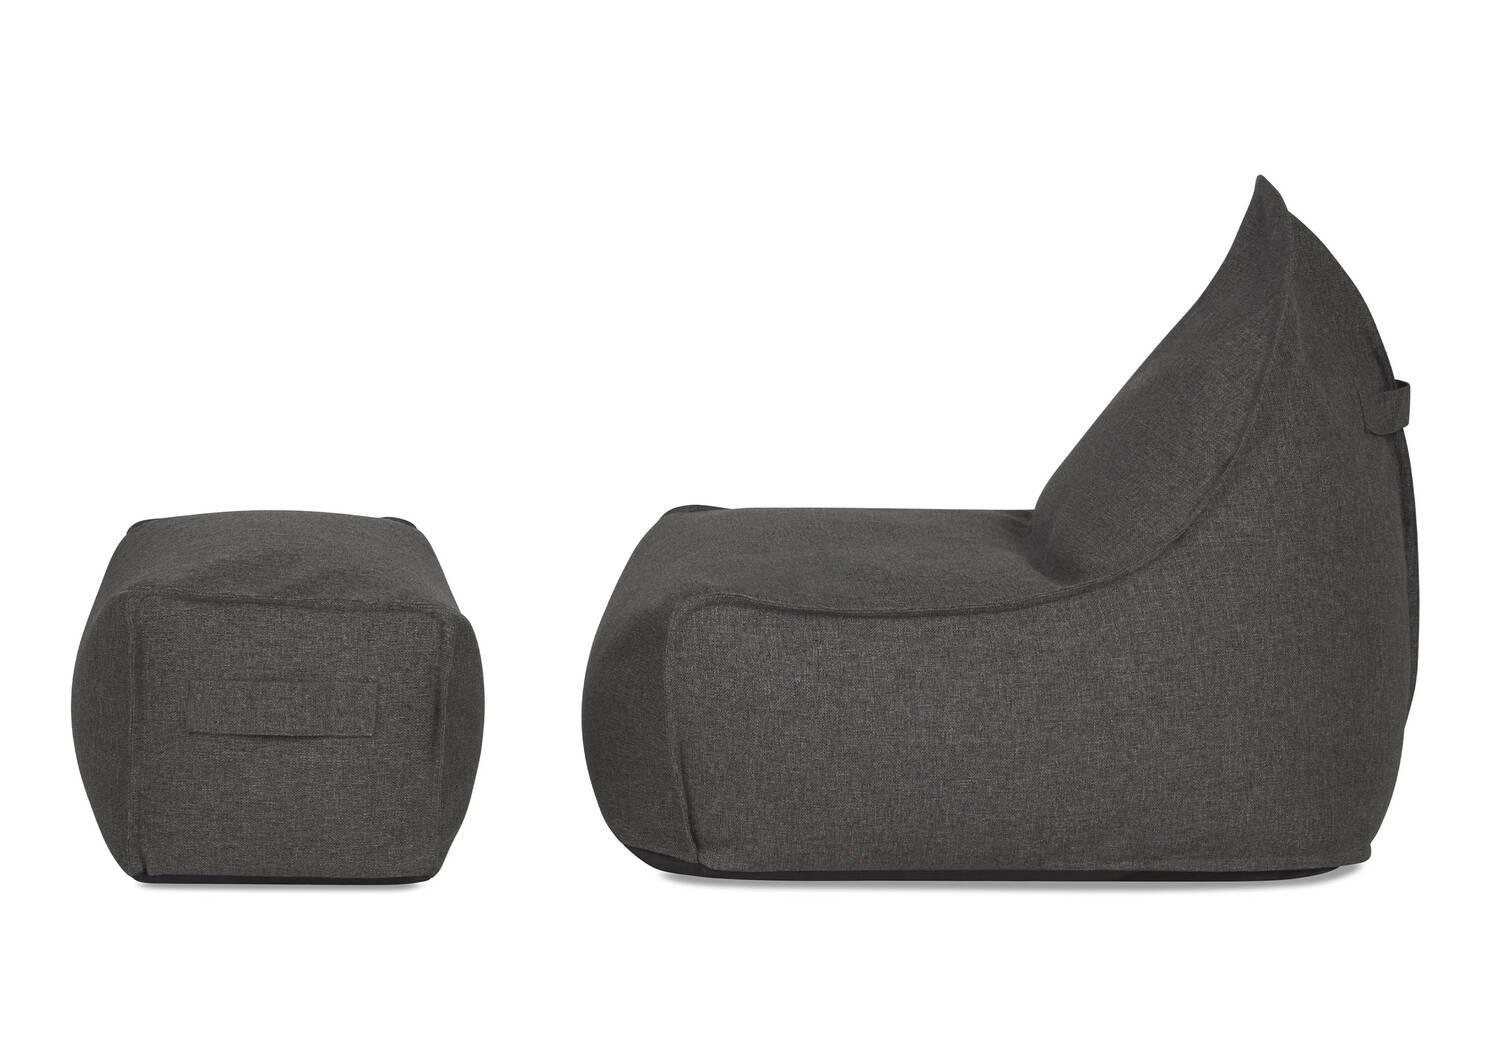 Cabana Chair w/ Ottoman -Kobe Graphite